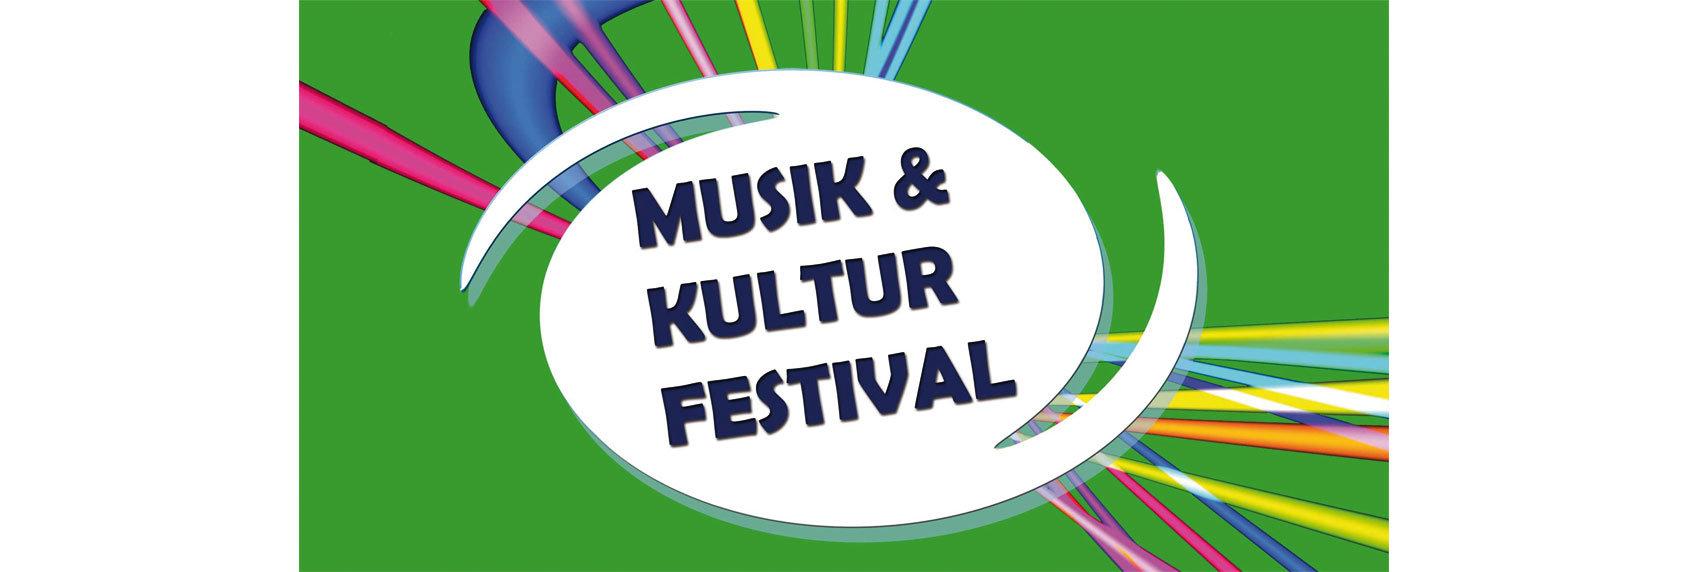 Musik & Kultur Festival